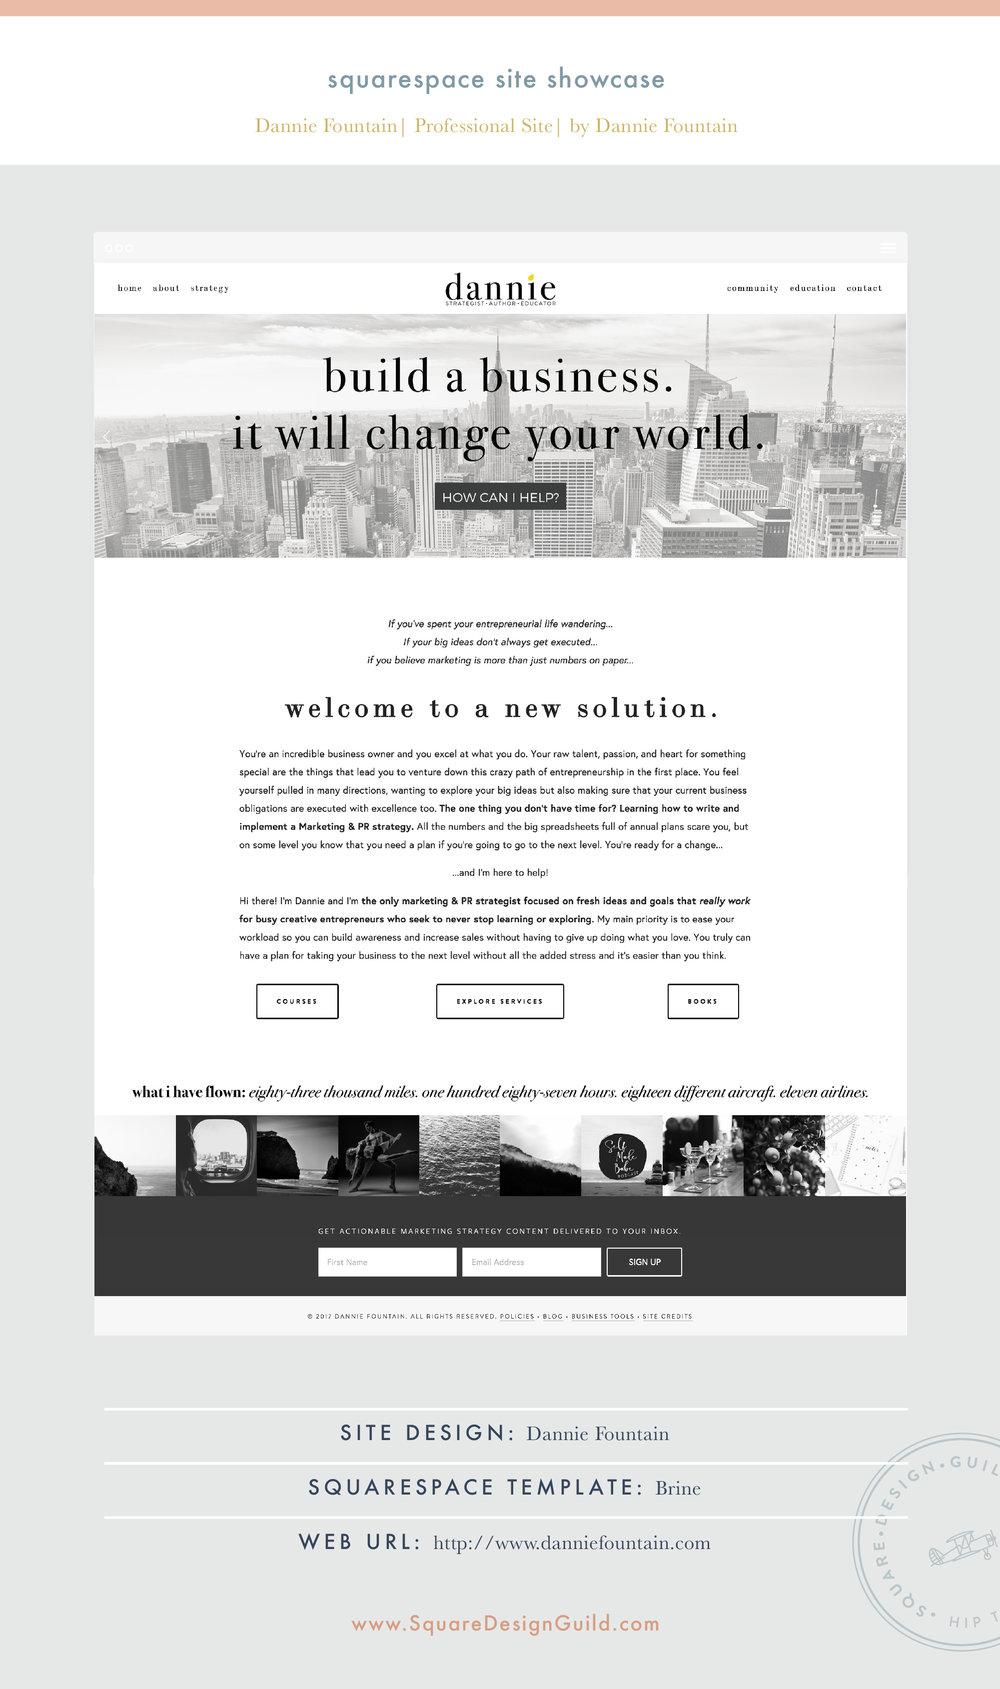 Square+Design+Guild+_+Squarespace+Site+Showcase+_+Dannie+Fountain+on+the+Brine+Template.jpeg